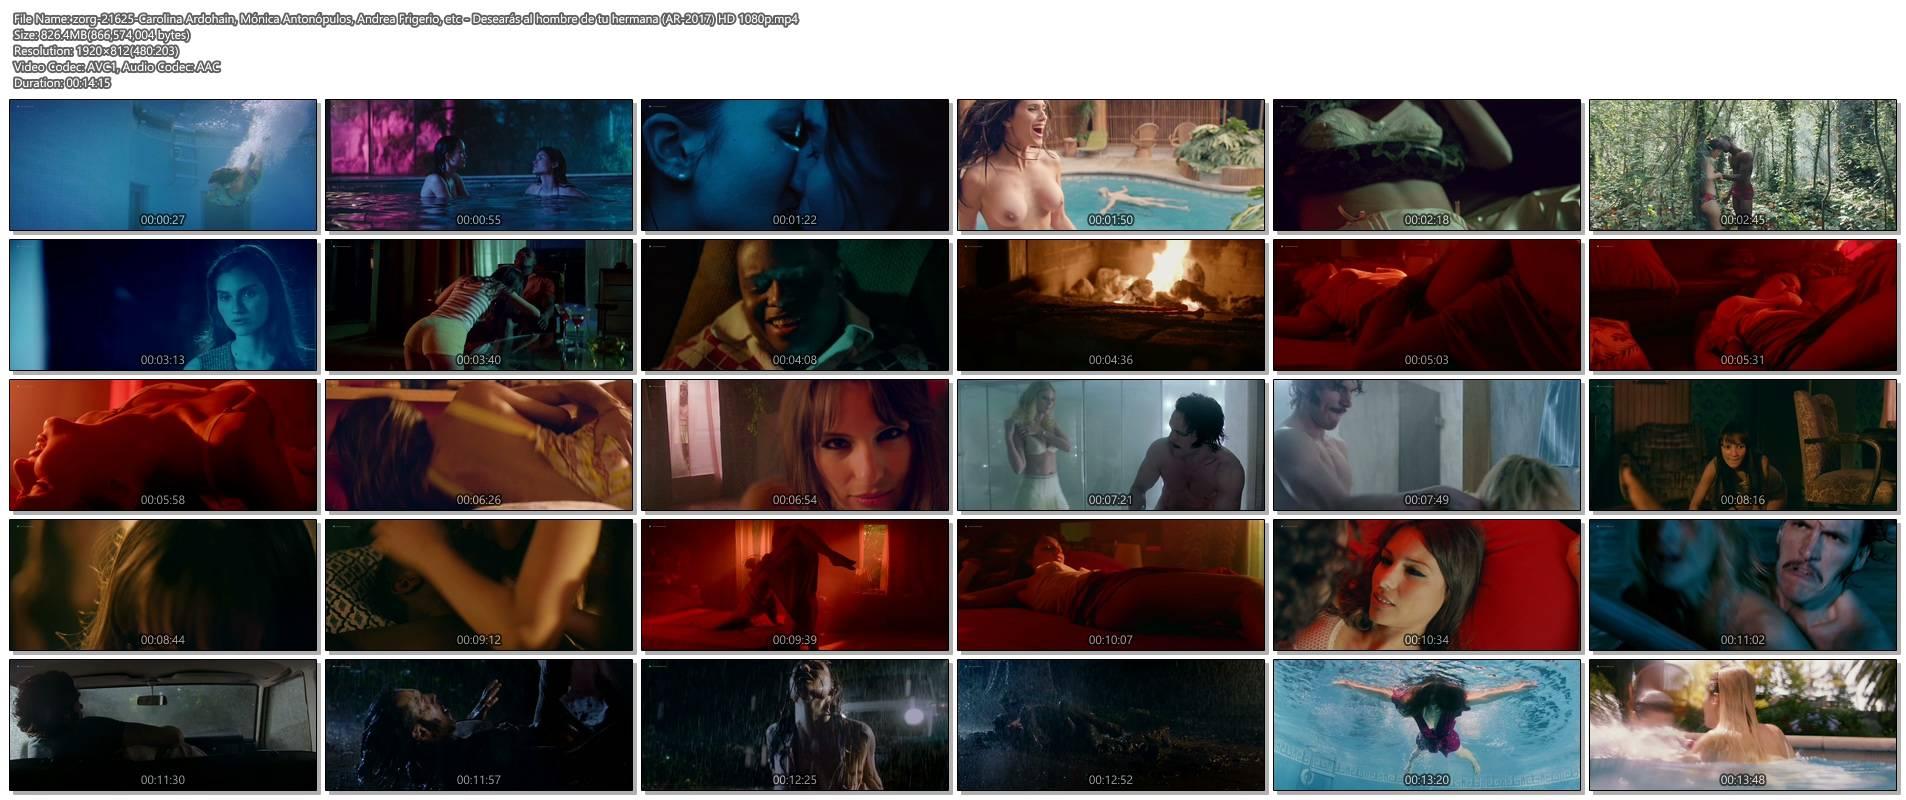 Monika Lundi Nude, Fappening, Sexy Photos, Uncensored